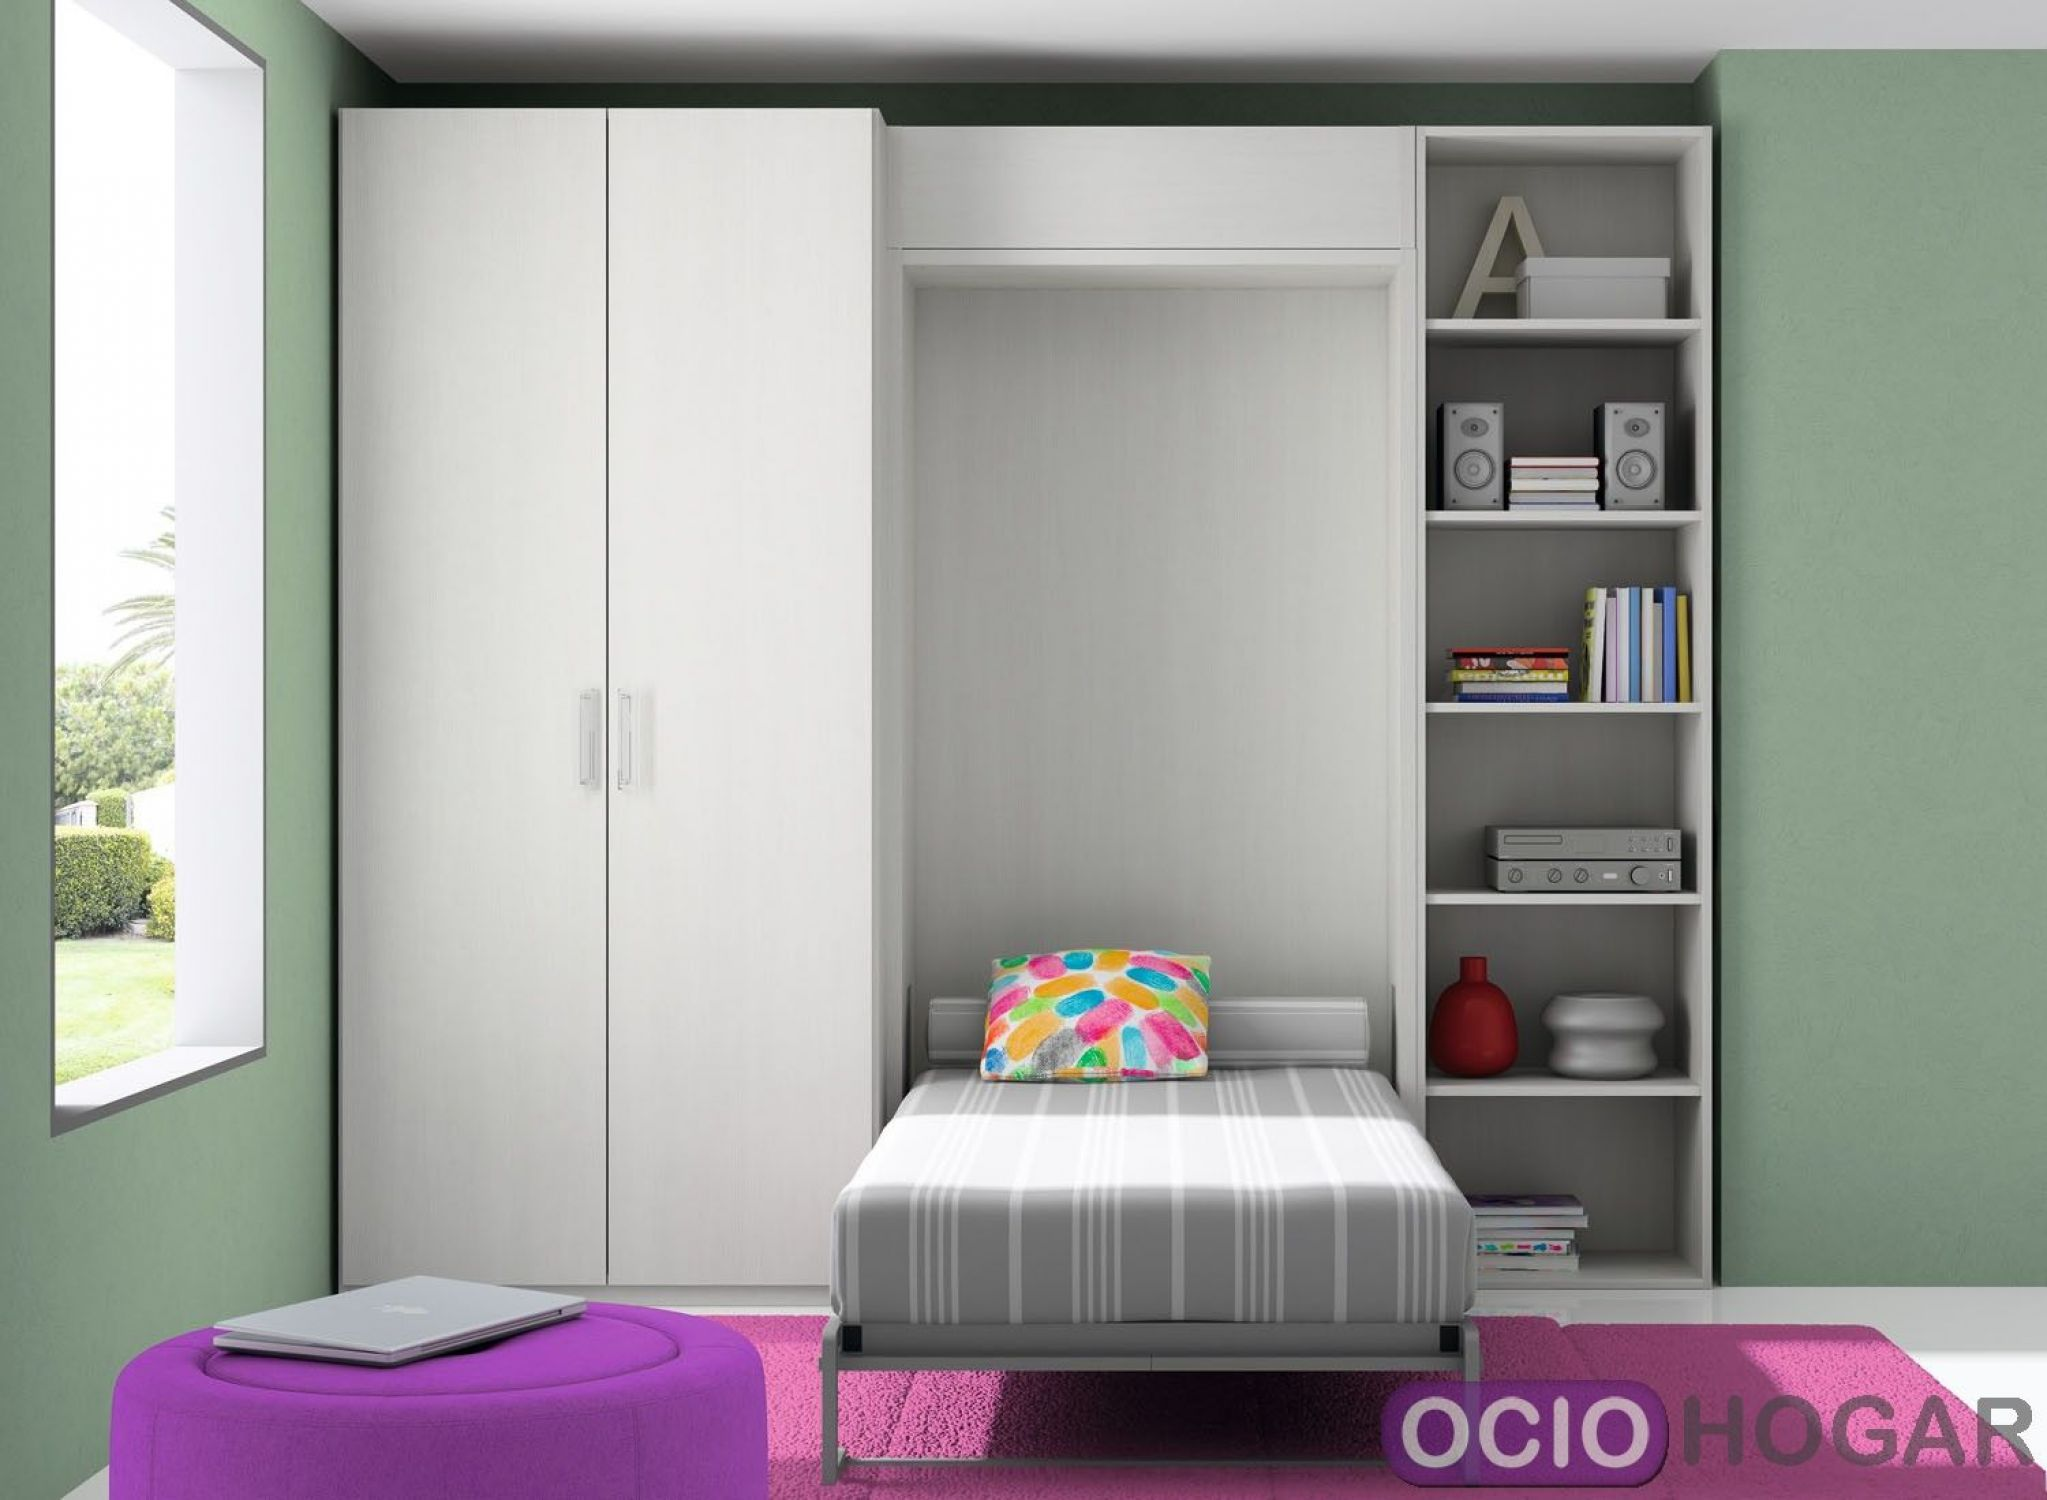 Dormitorio infantil closet de dissery muebles juveniles for Muebles para dormitorios pequenos juveniles